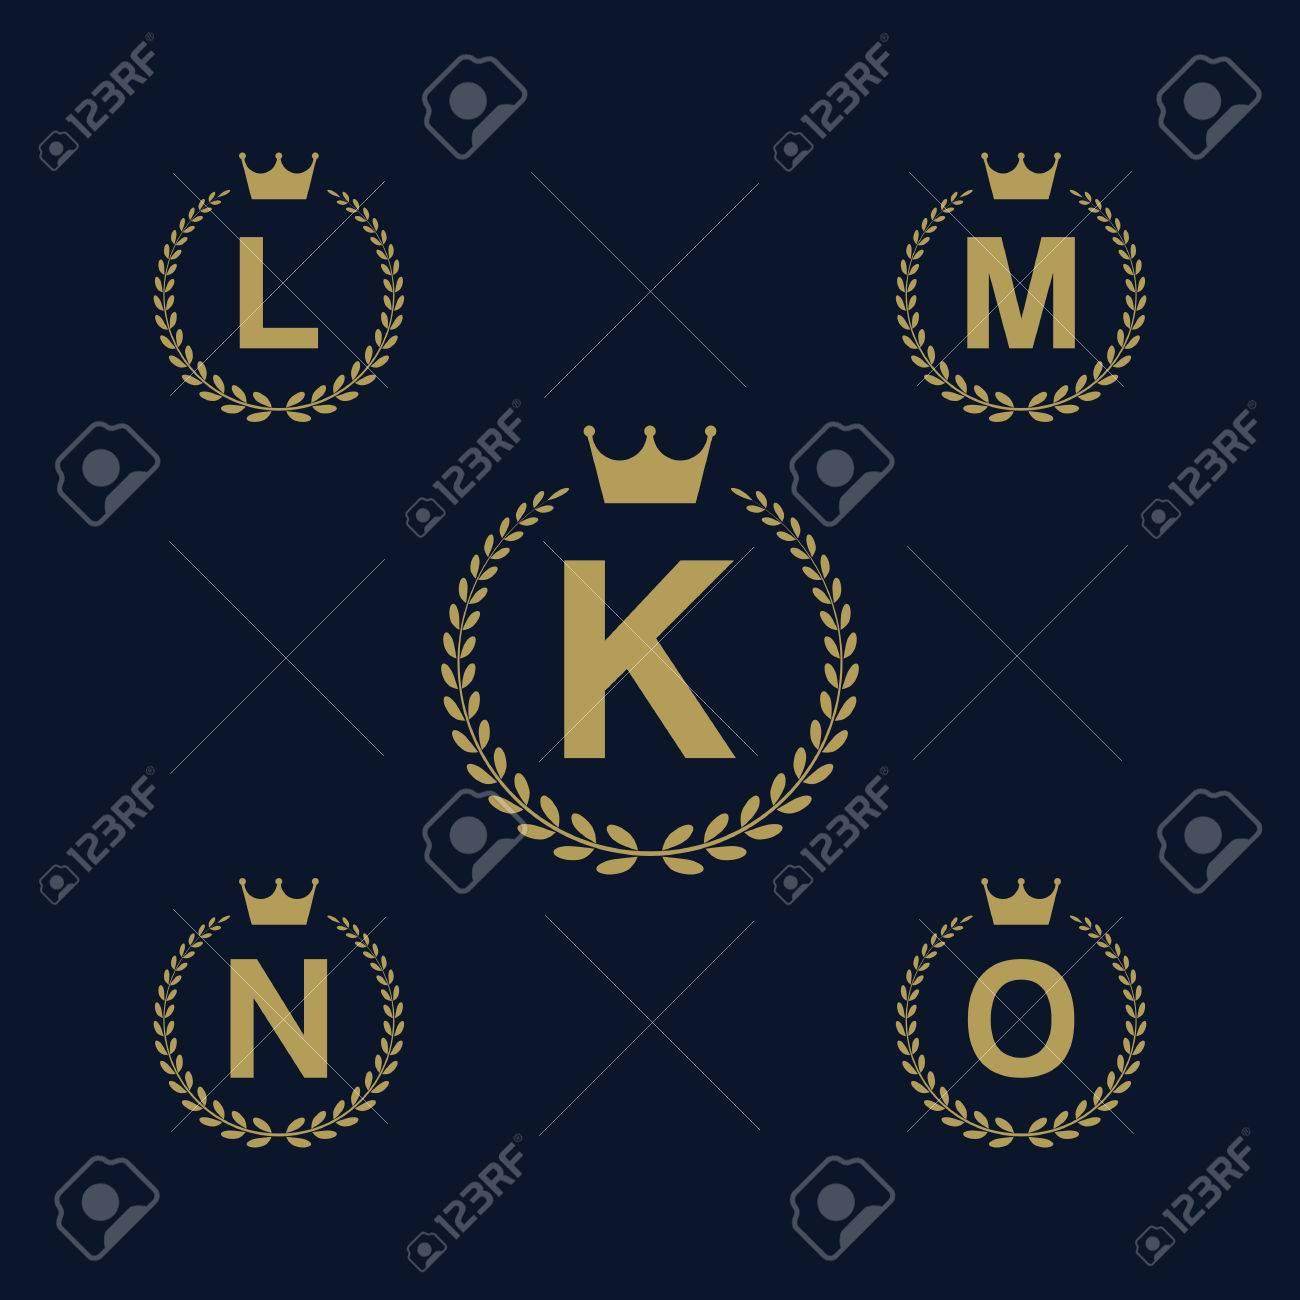 7fa15fa6 Laurel wreath logo icon with capital alphabet letters. Design template  elements - Letter K,